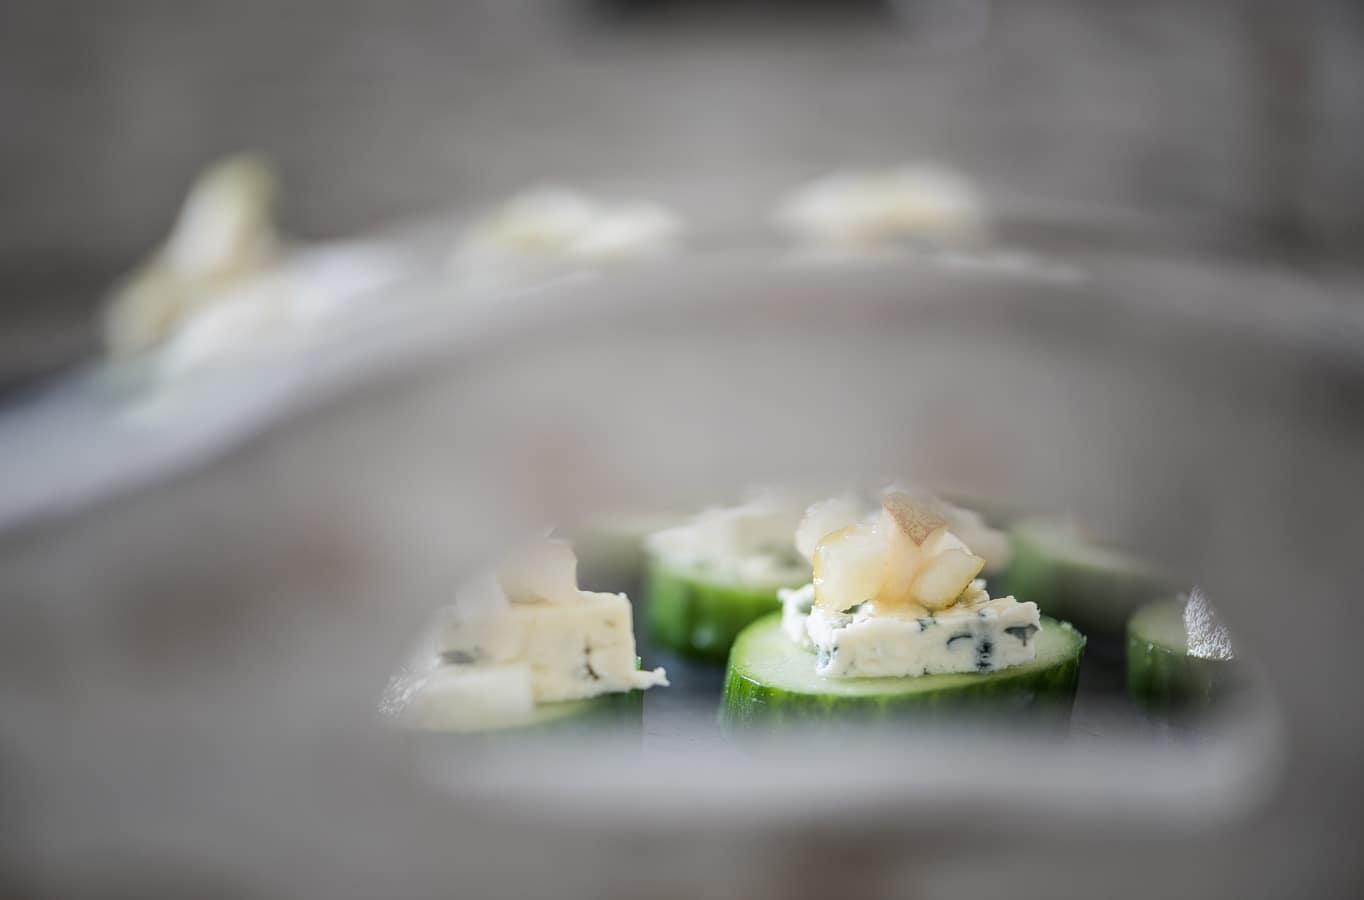 Recept komkommertoastjes